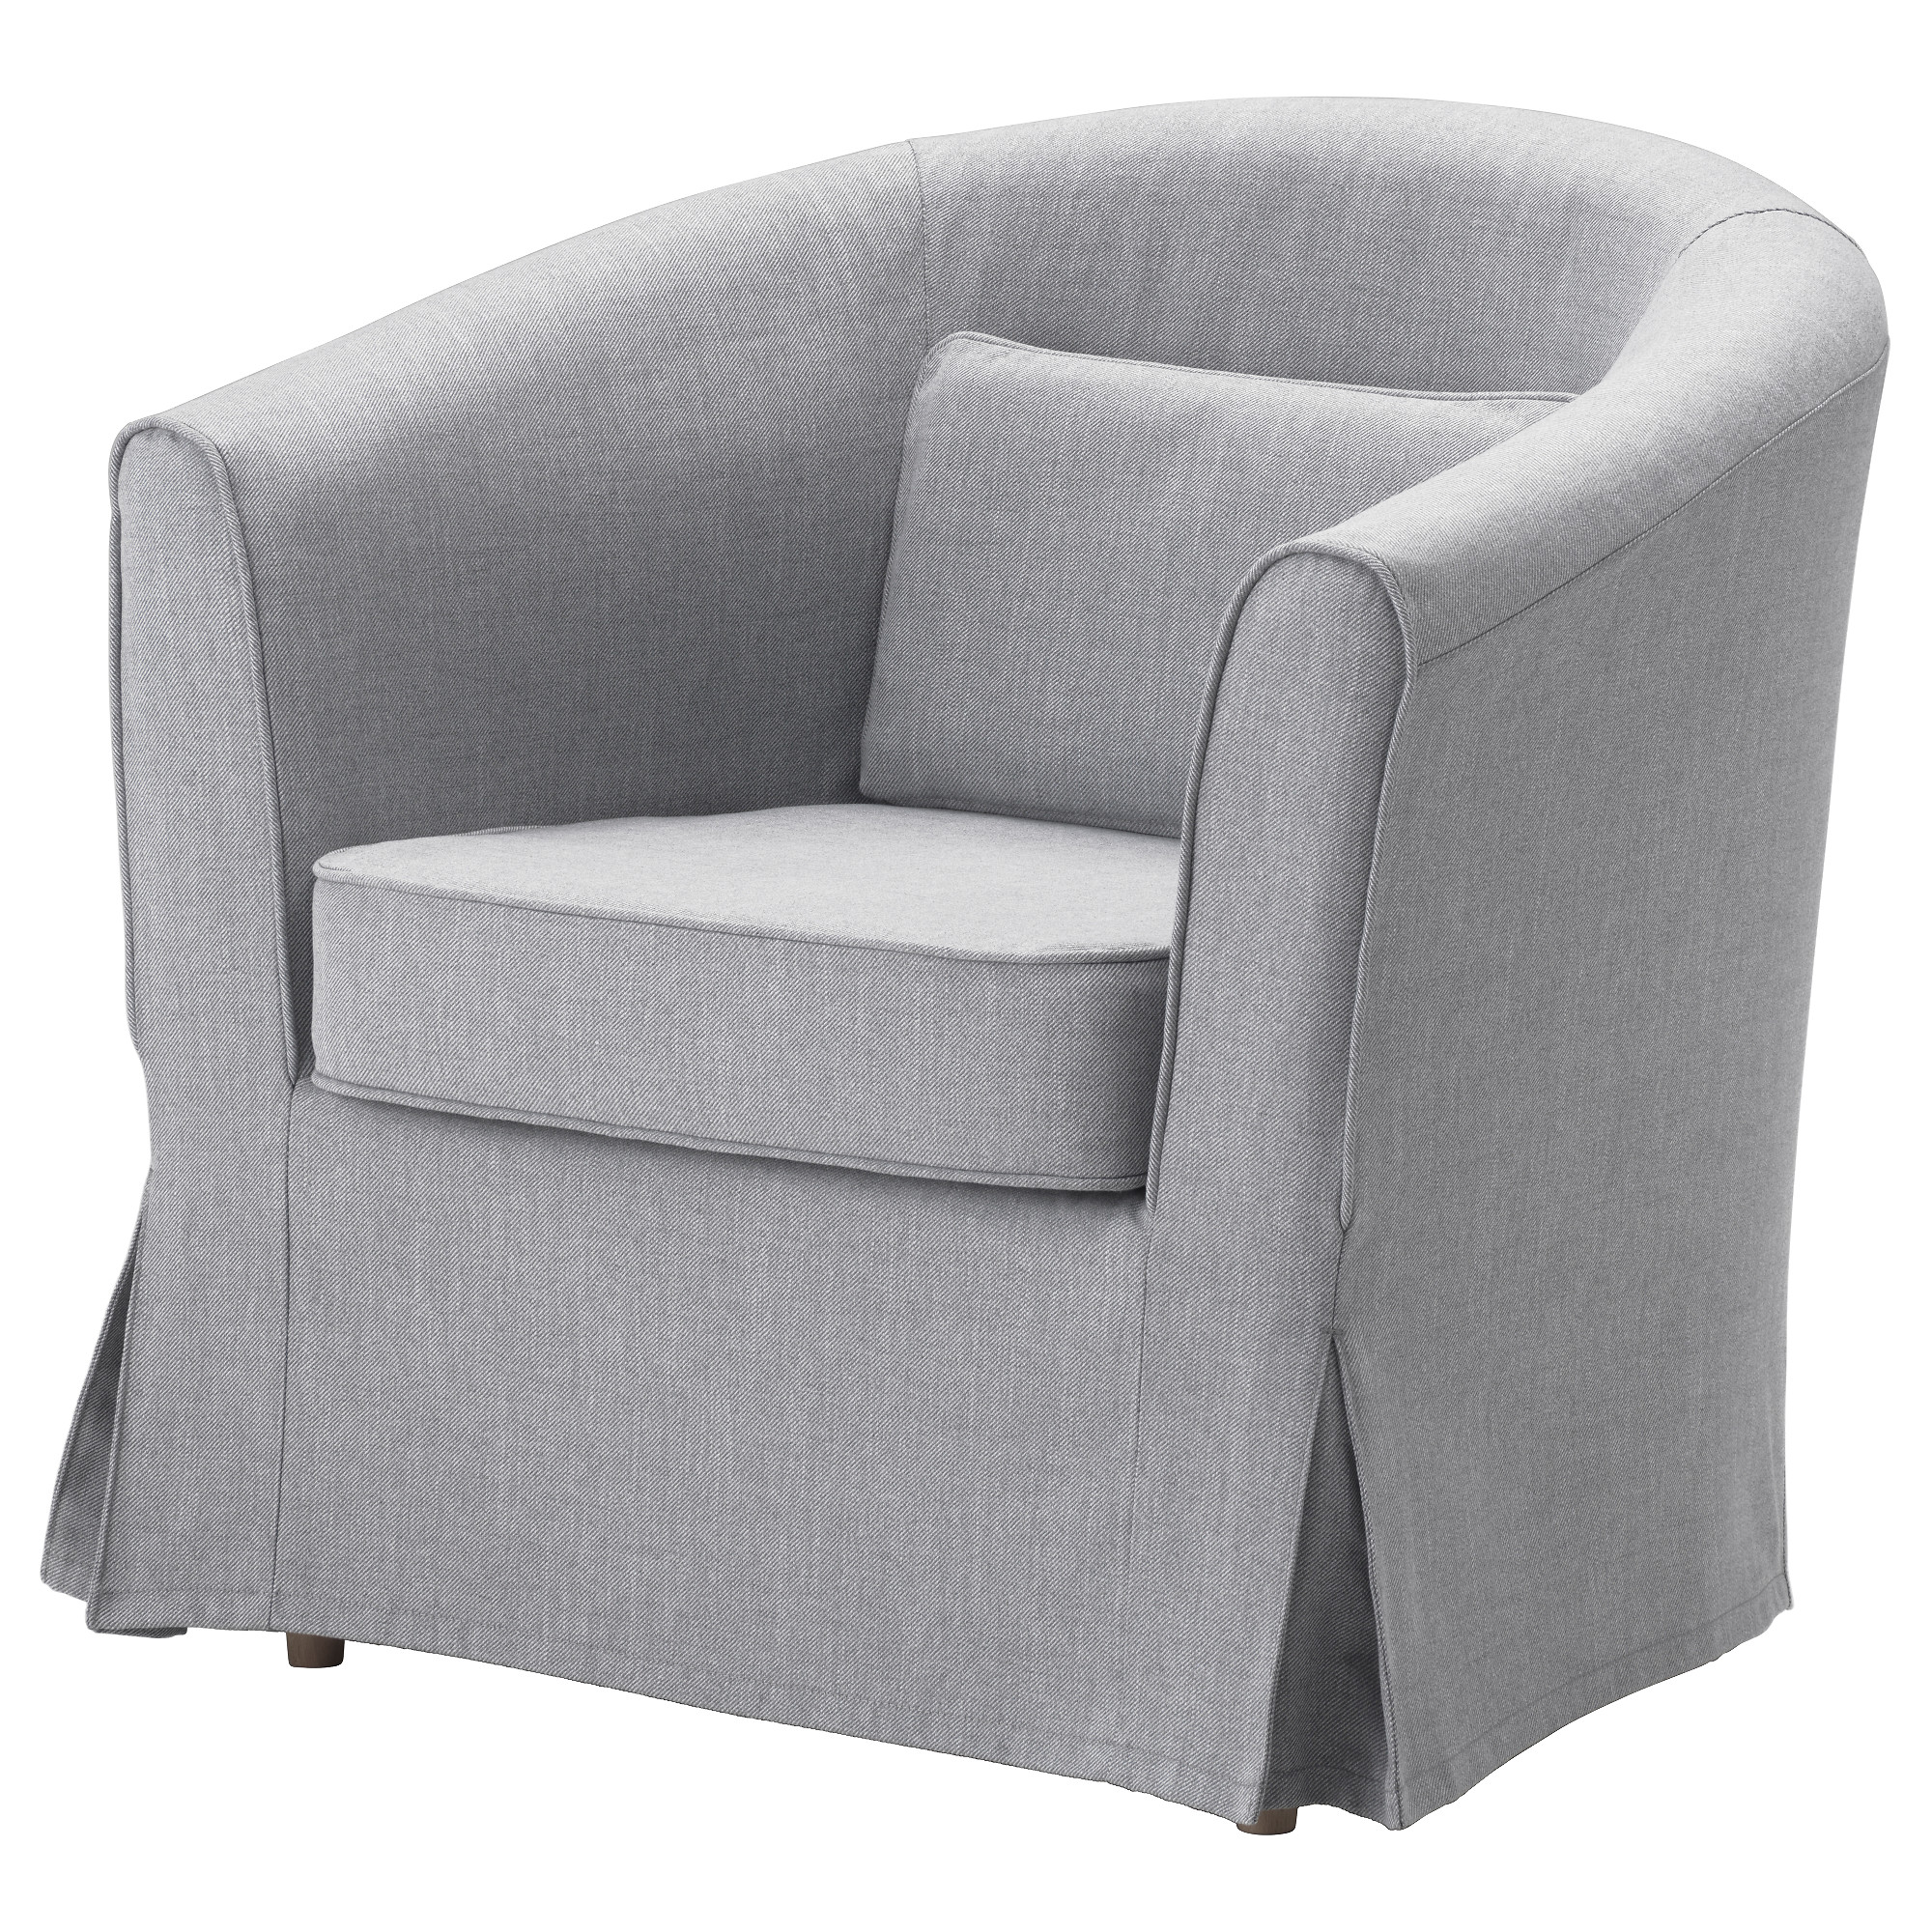 Ikea Tullsta Armchair Cover Nordvalla Medium Gray